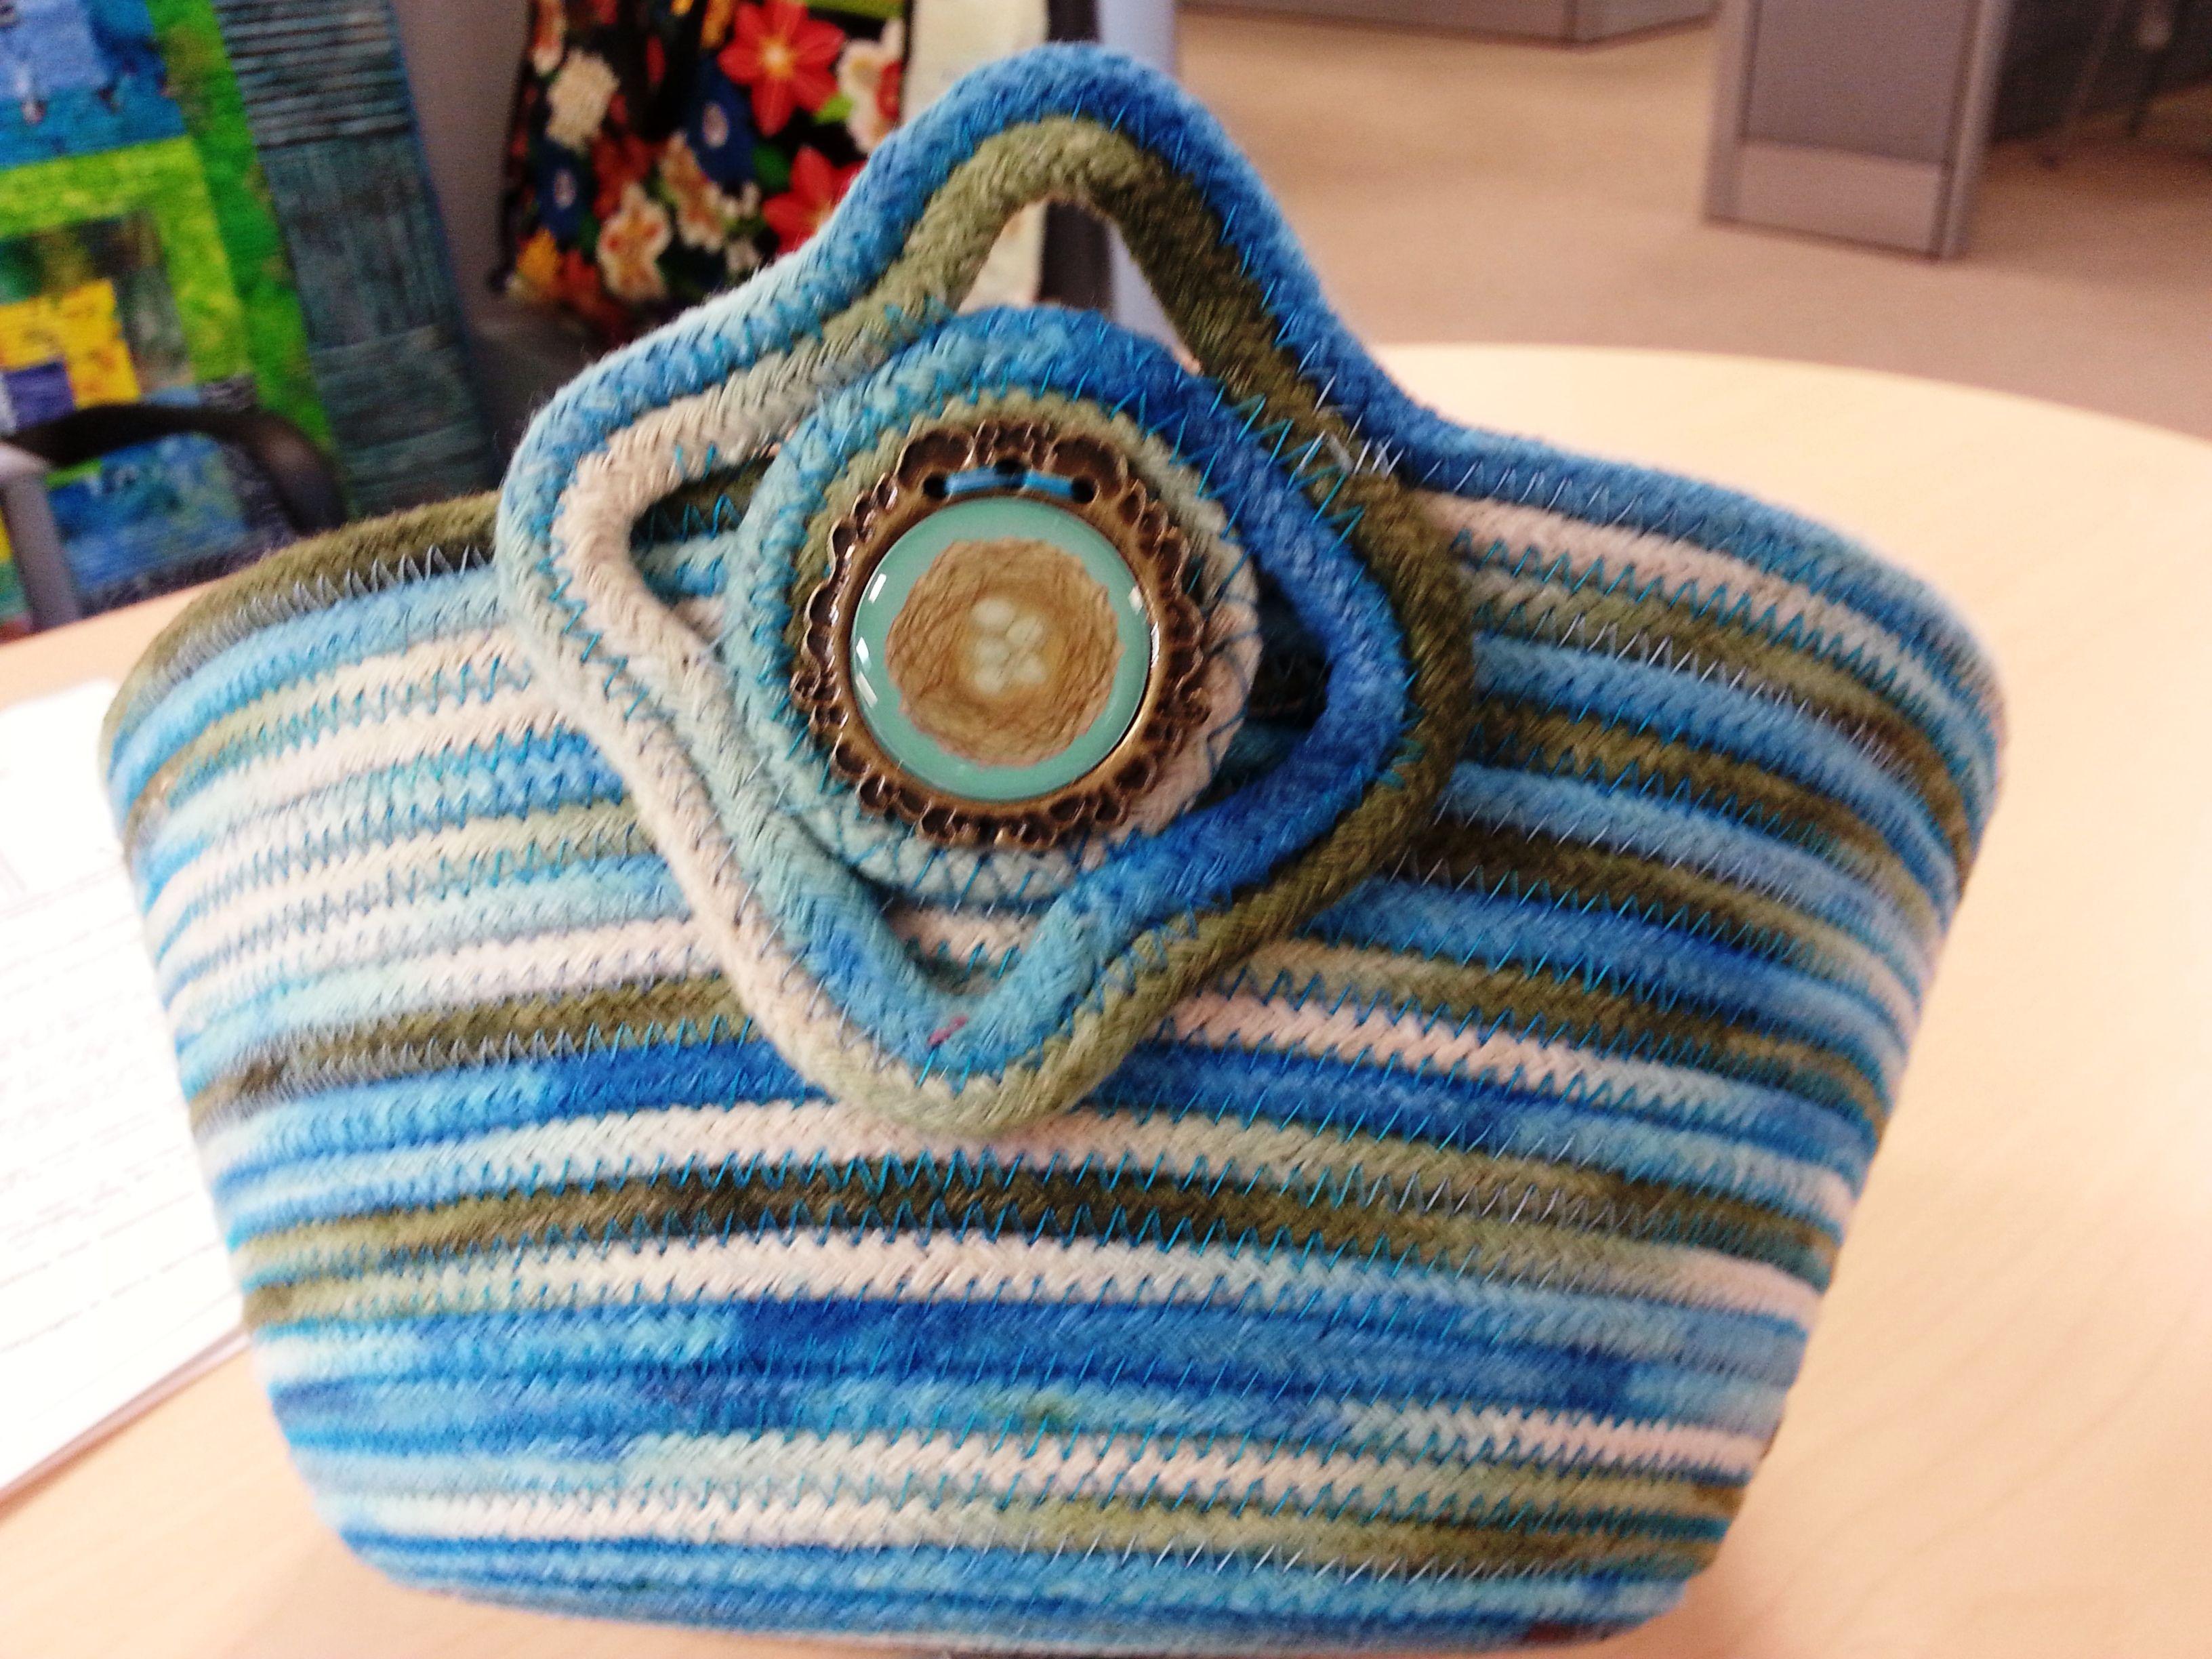 Cotton Clothesline Rope Hand Dyed Cotton Clothesline Basket Madediane Fama  A Tisket A